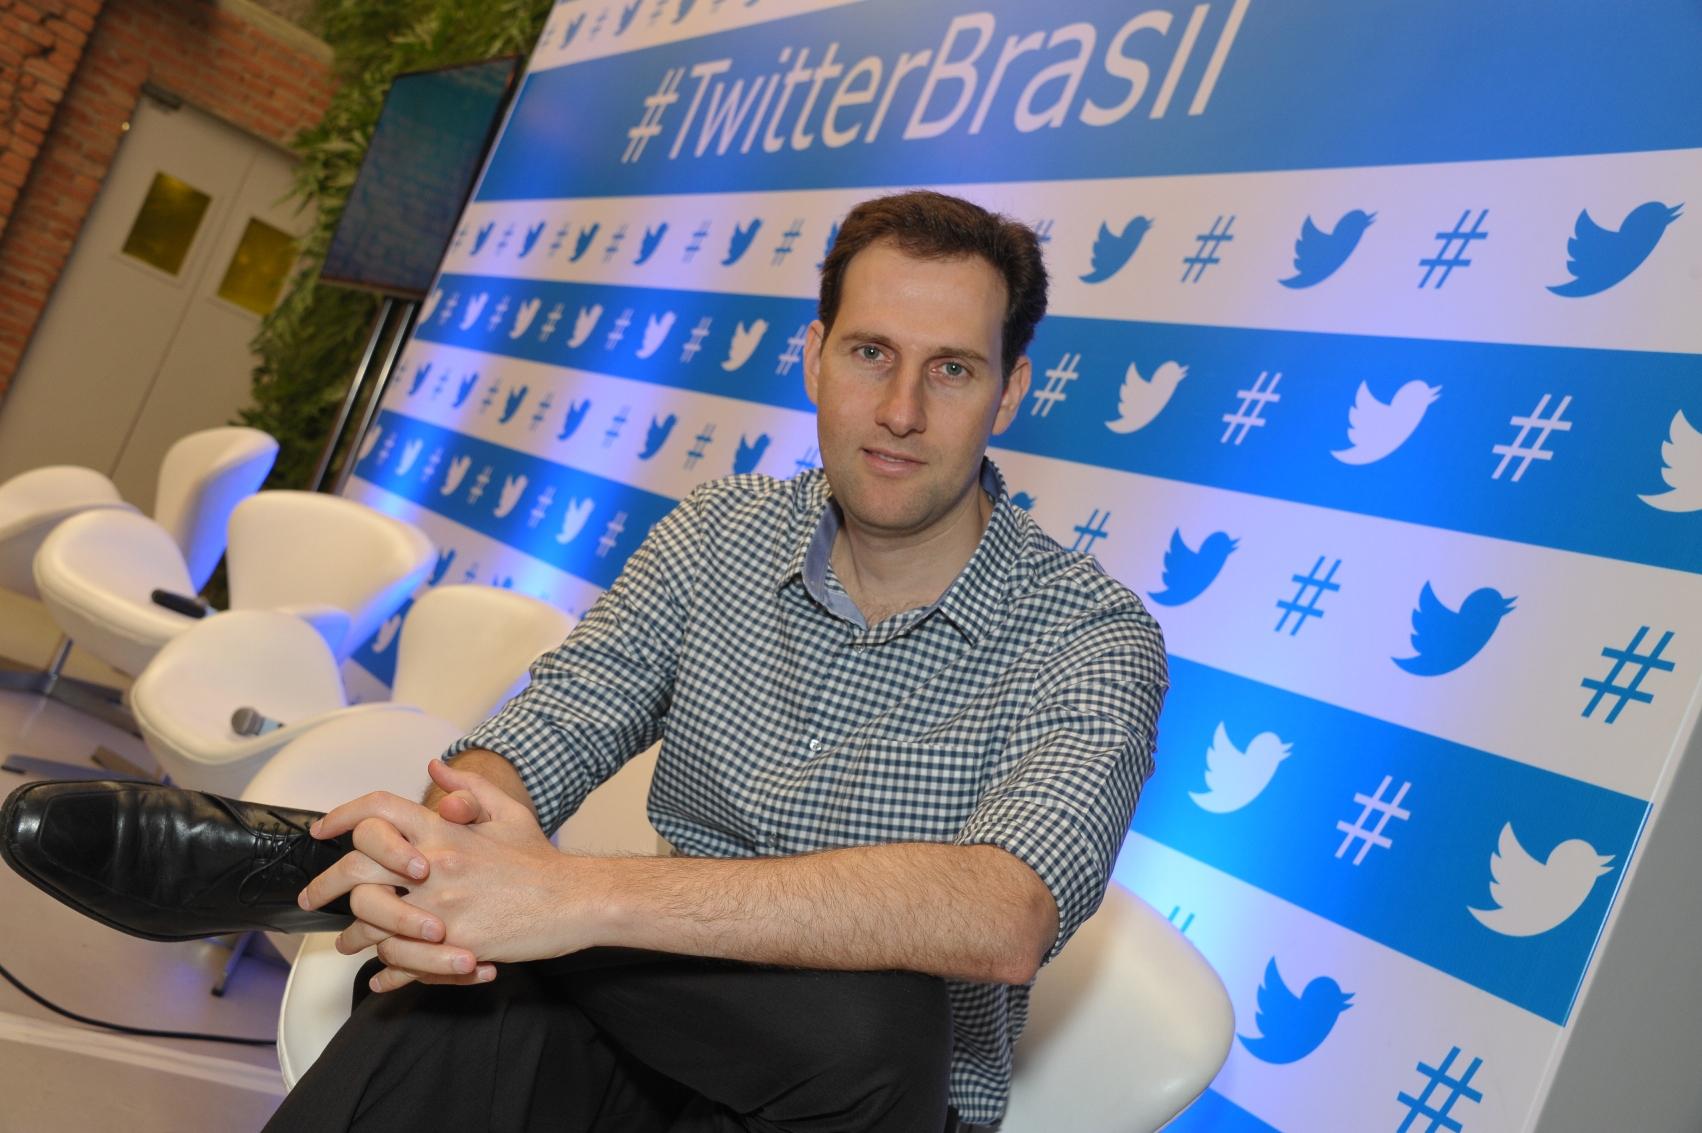 Guilherme Ribenboim Twitter (1)